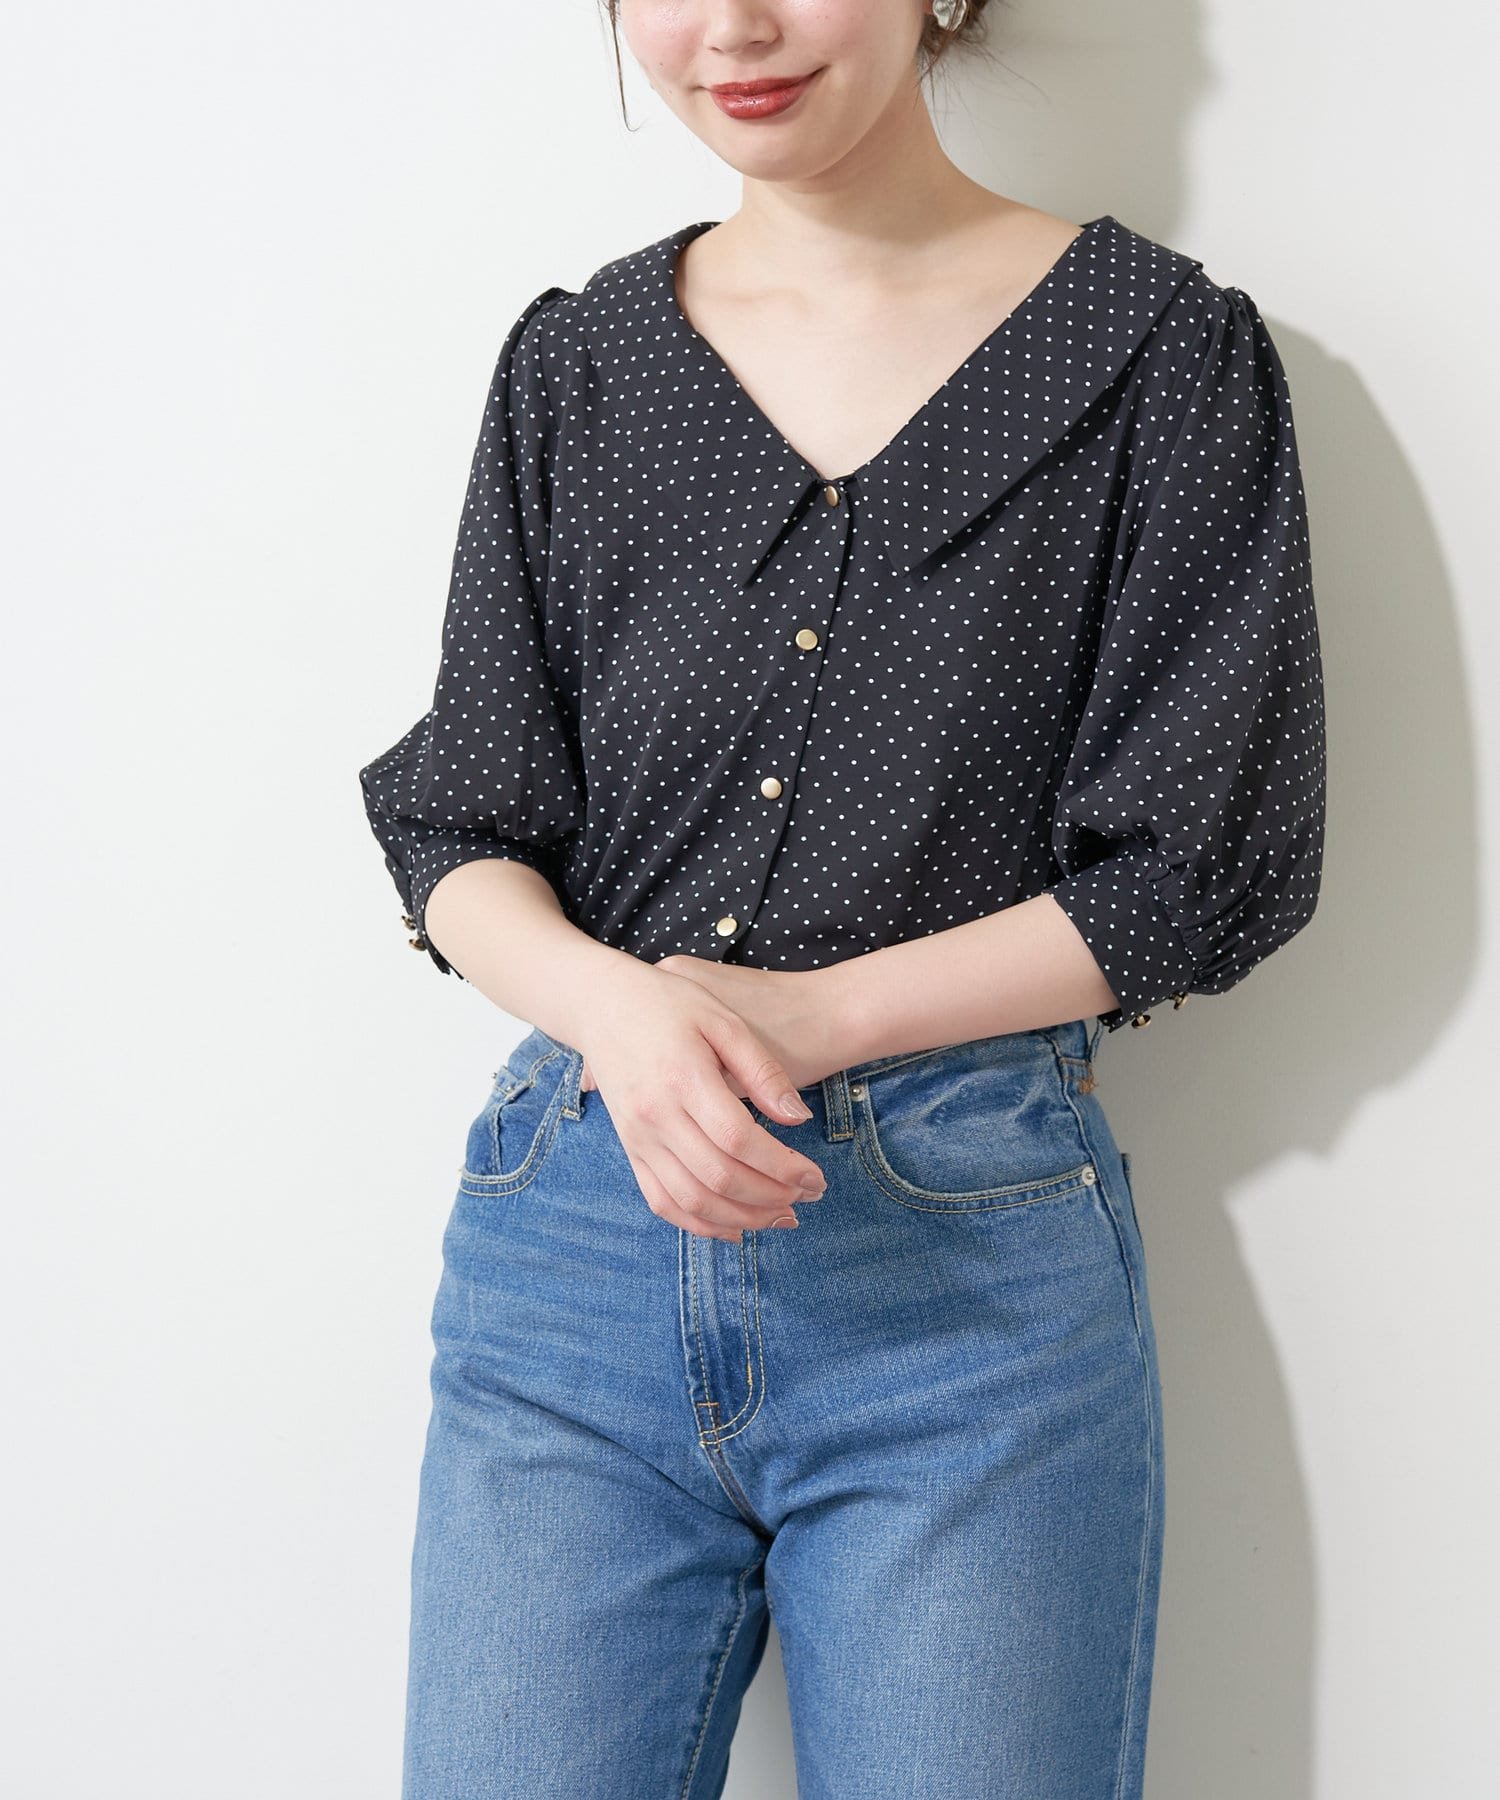 natural couture(ナチュラルクチュール) 【WEB限定】深V衿付きおしゃれブラウス